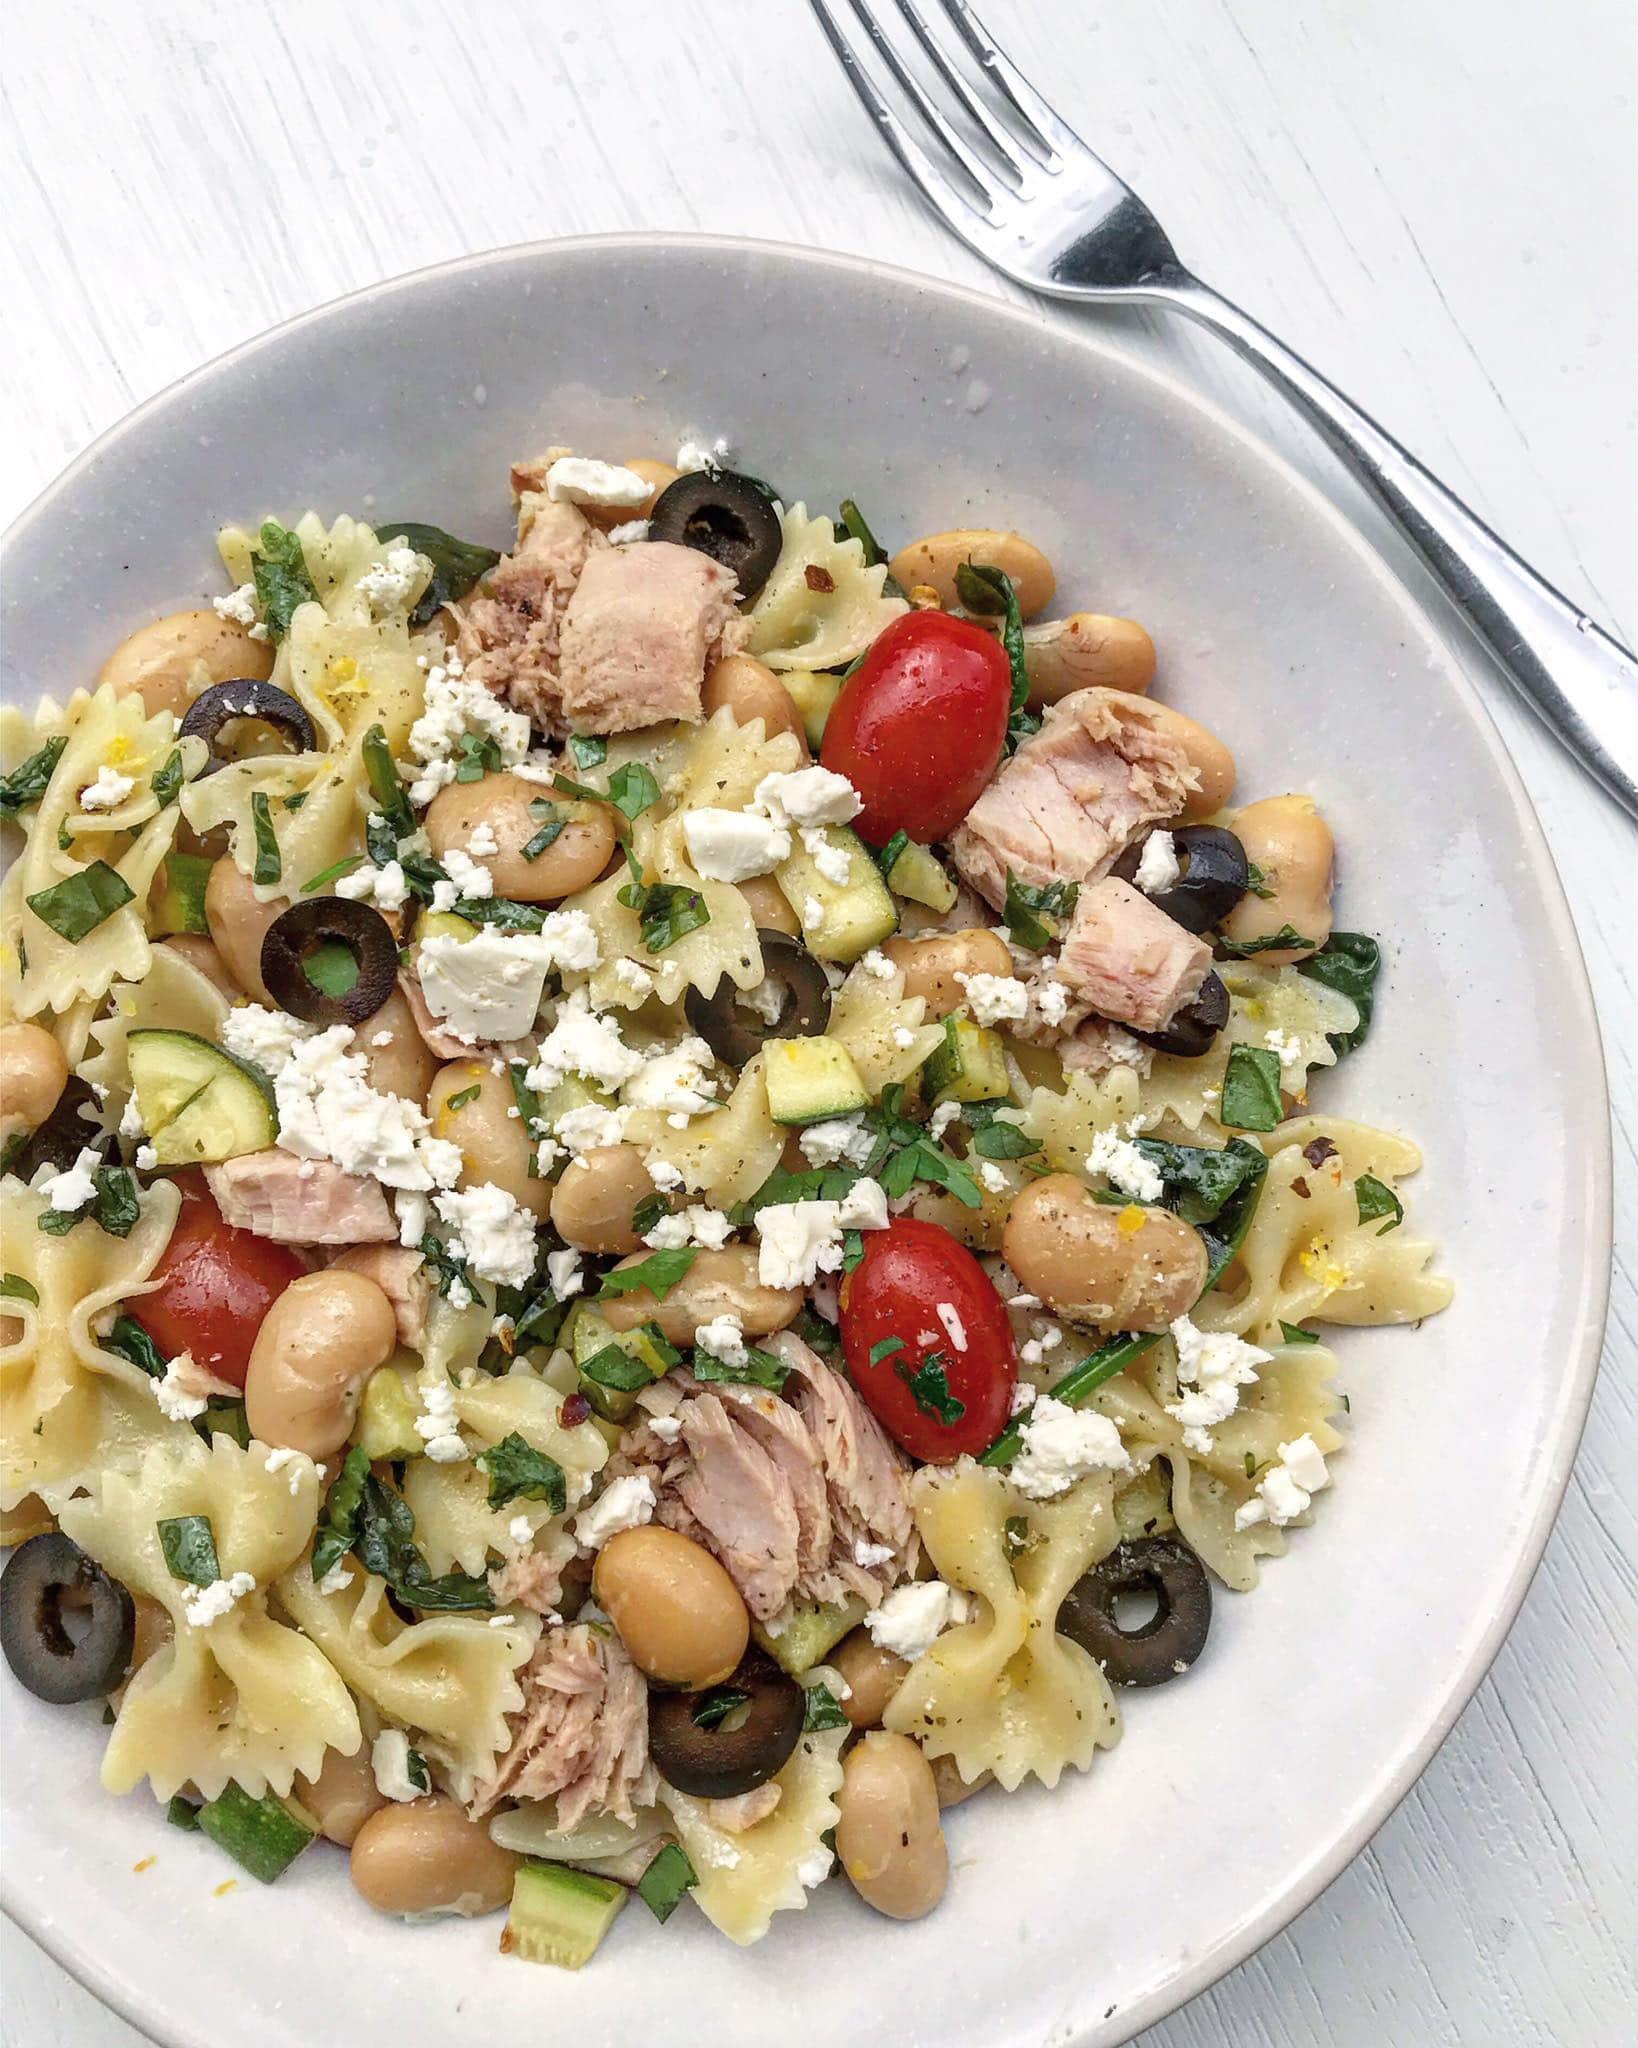 Tuna pasta with feta and olives.